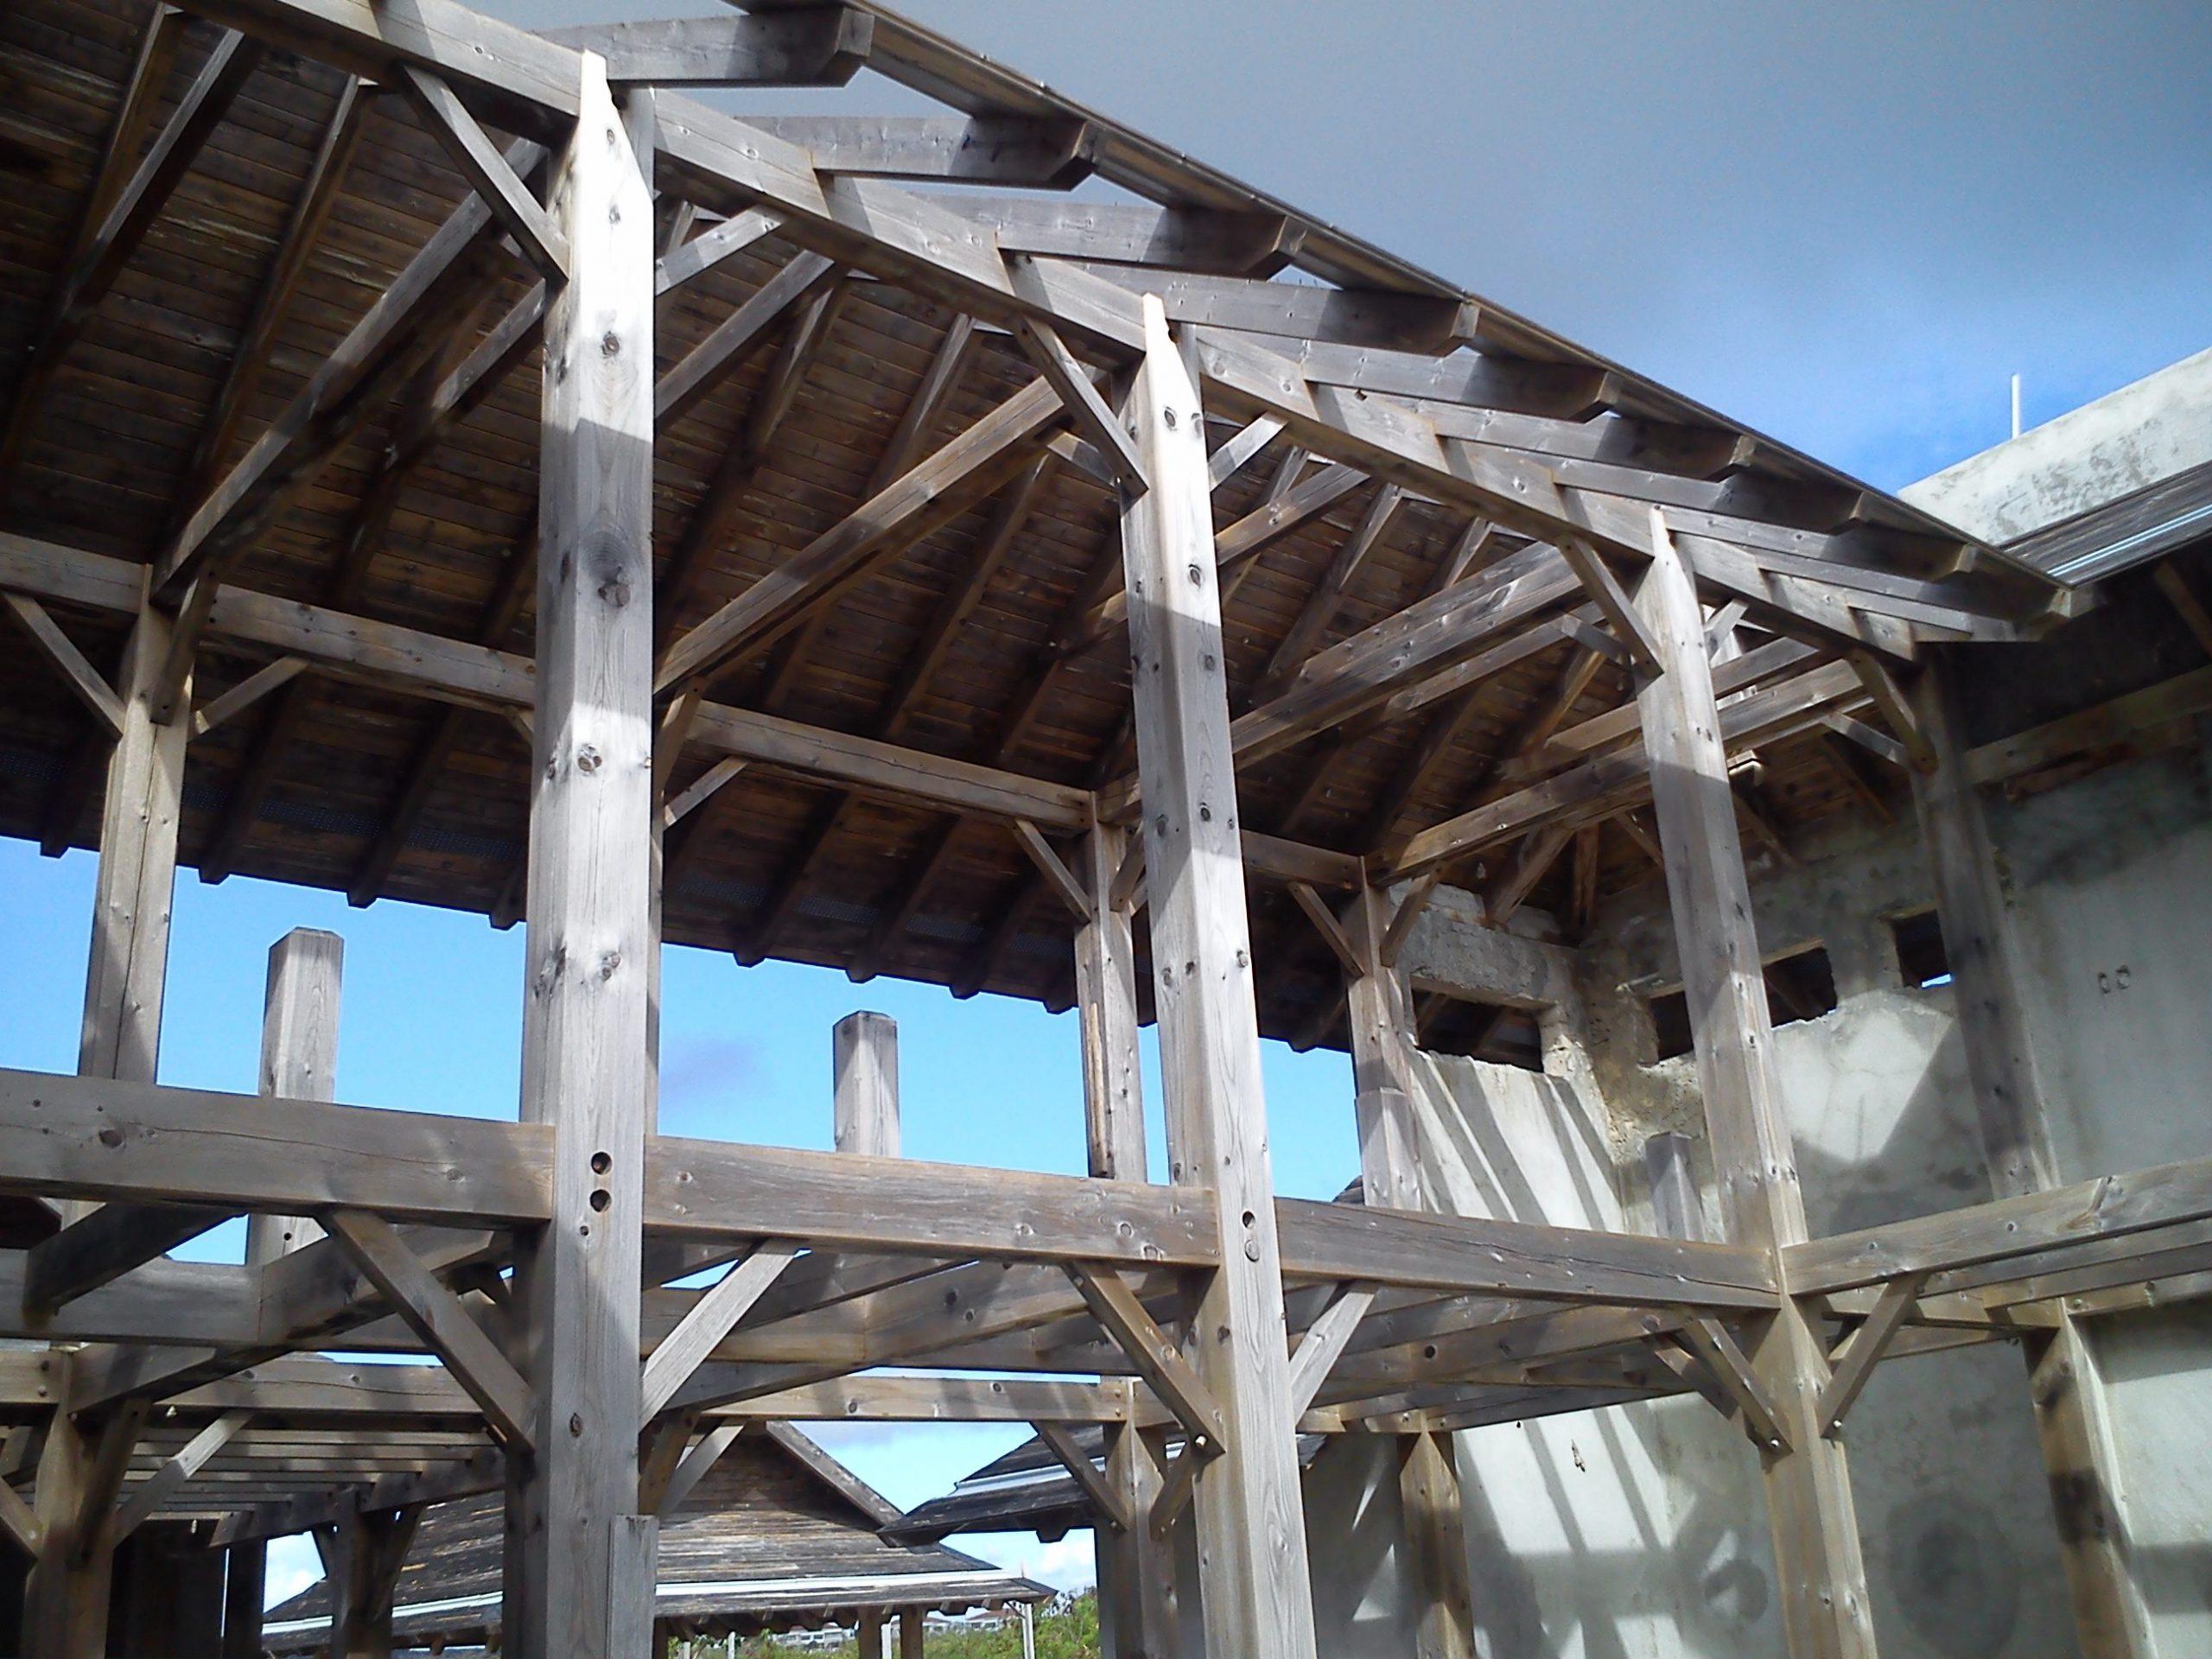 Normerica Timber Frames, Commercial Project, Las Iguana Villas, Dominican Republic, Villas, Construction